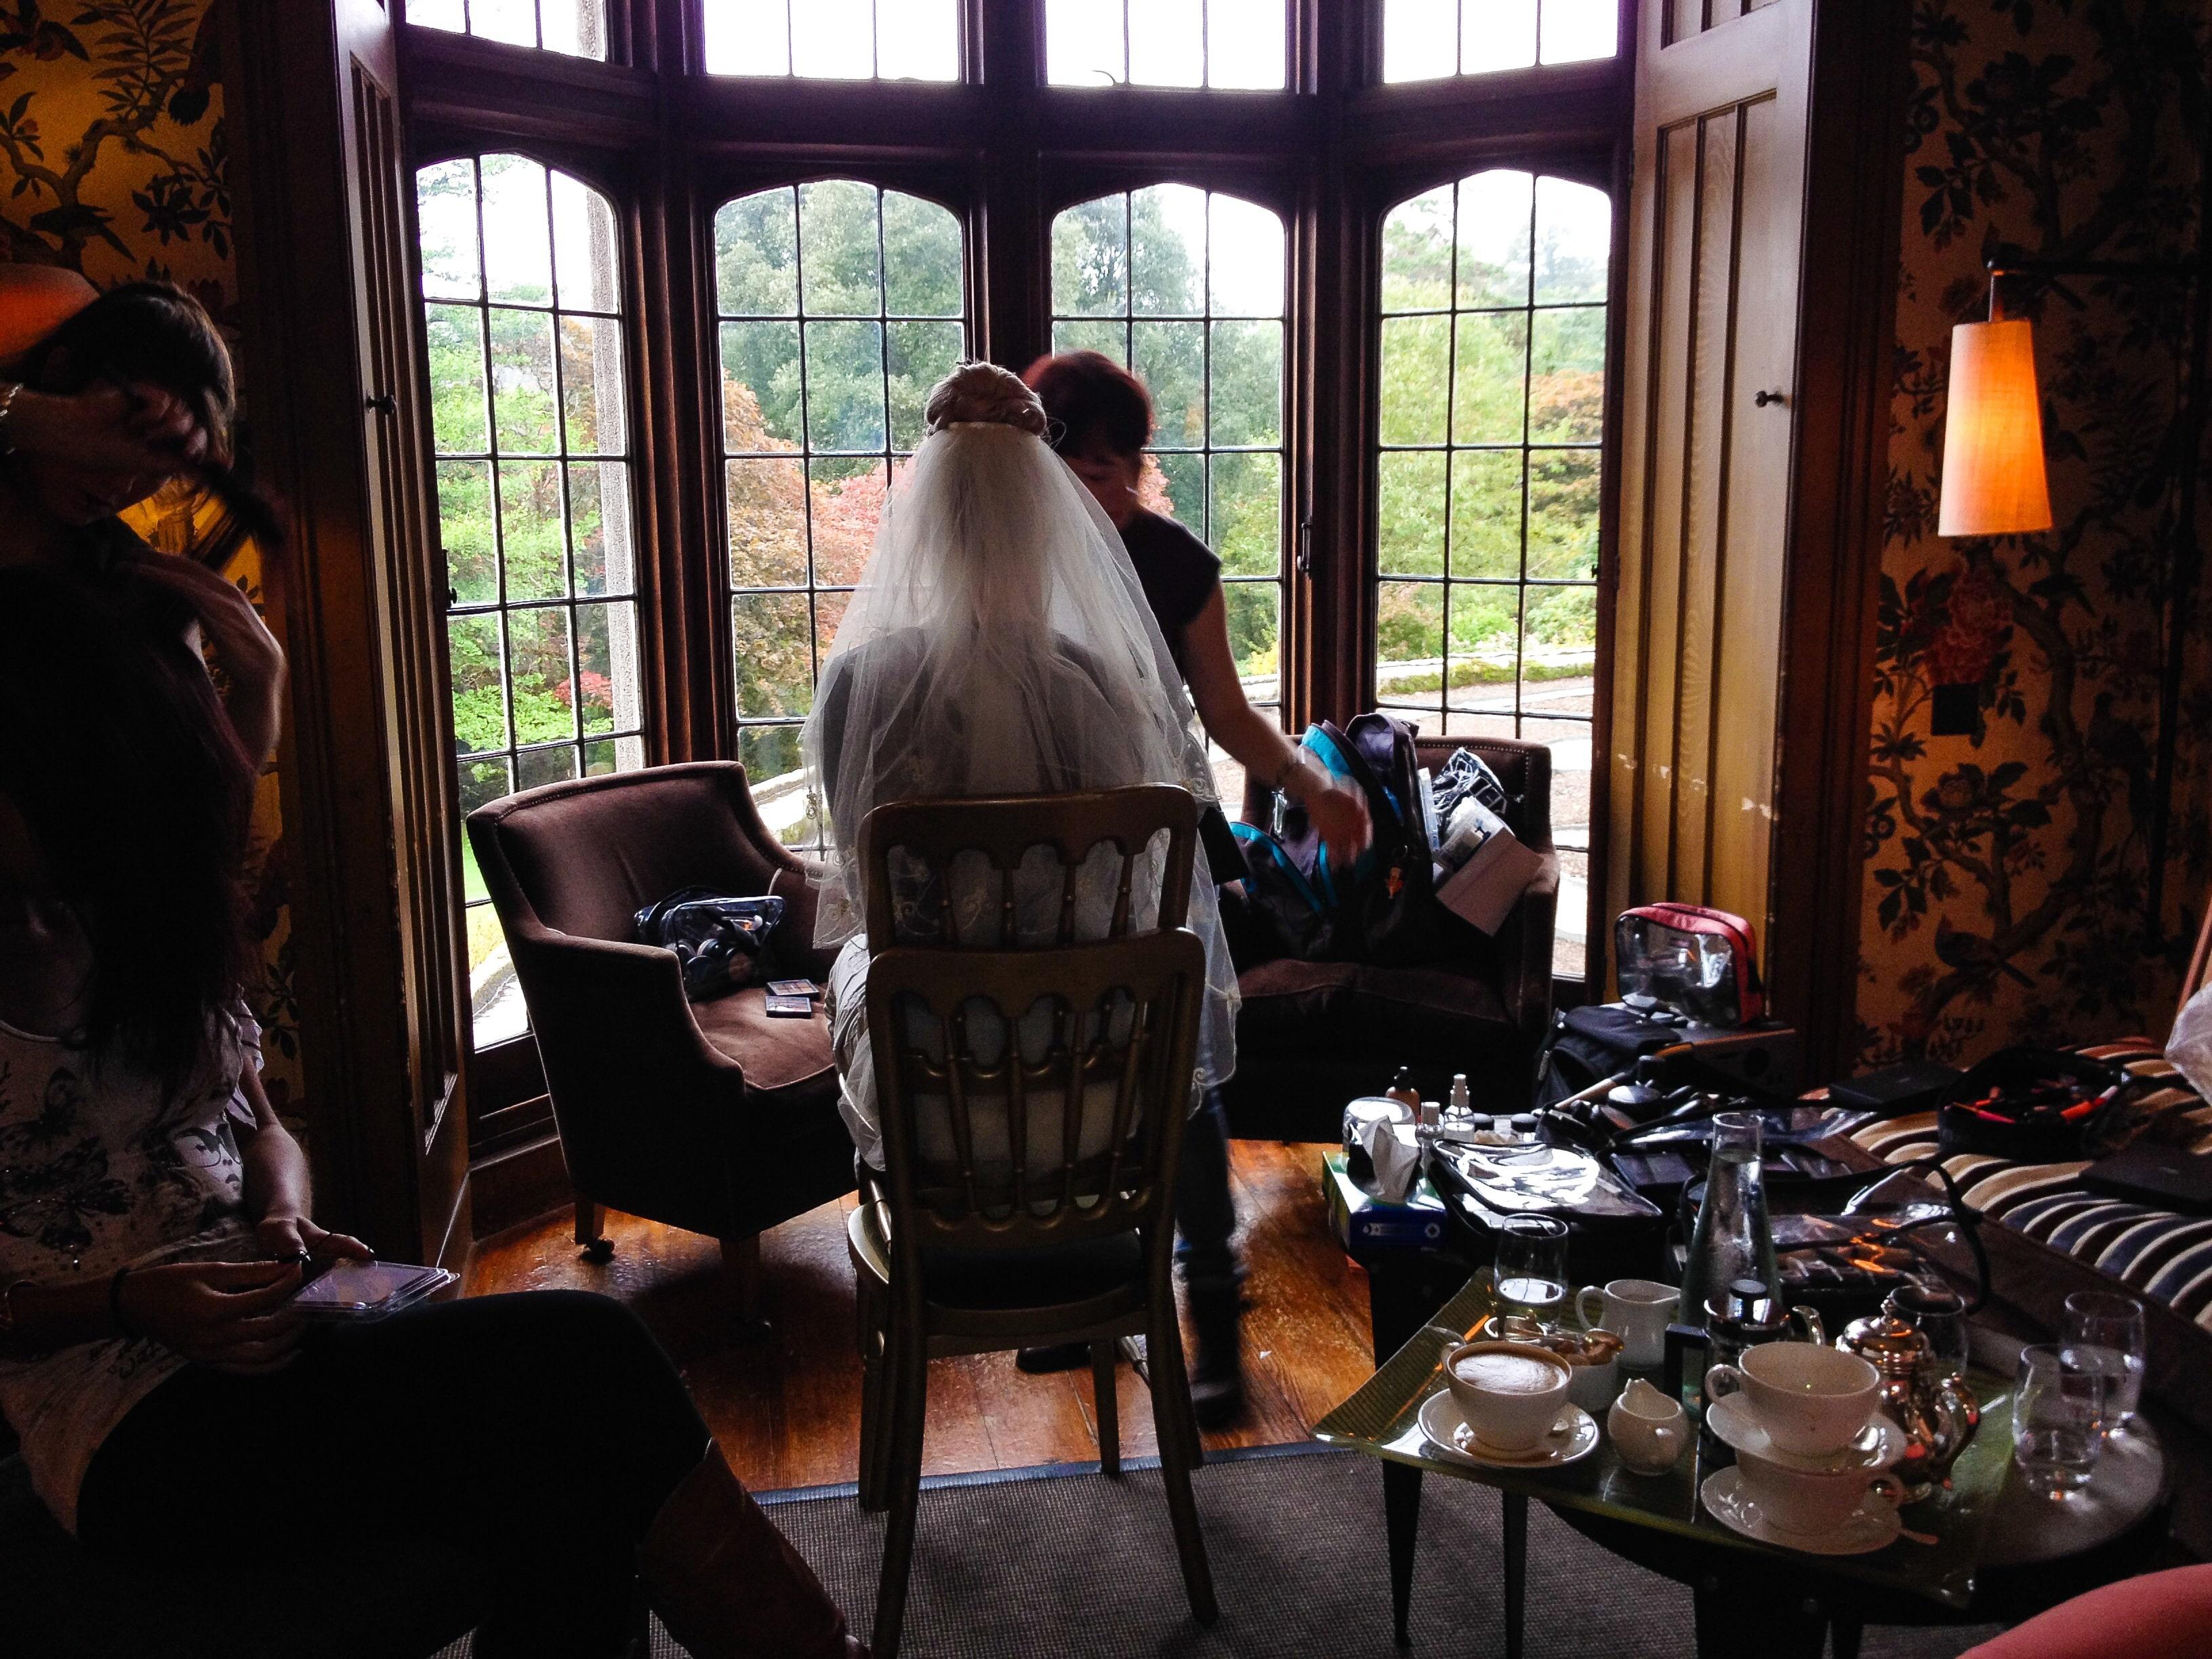 HOTEL ENDSLEIGH BRIDAL SHOOT